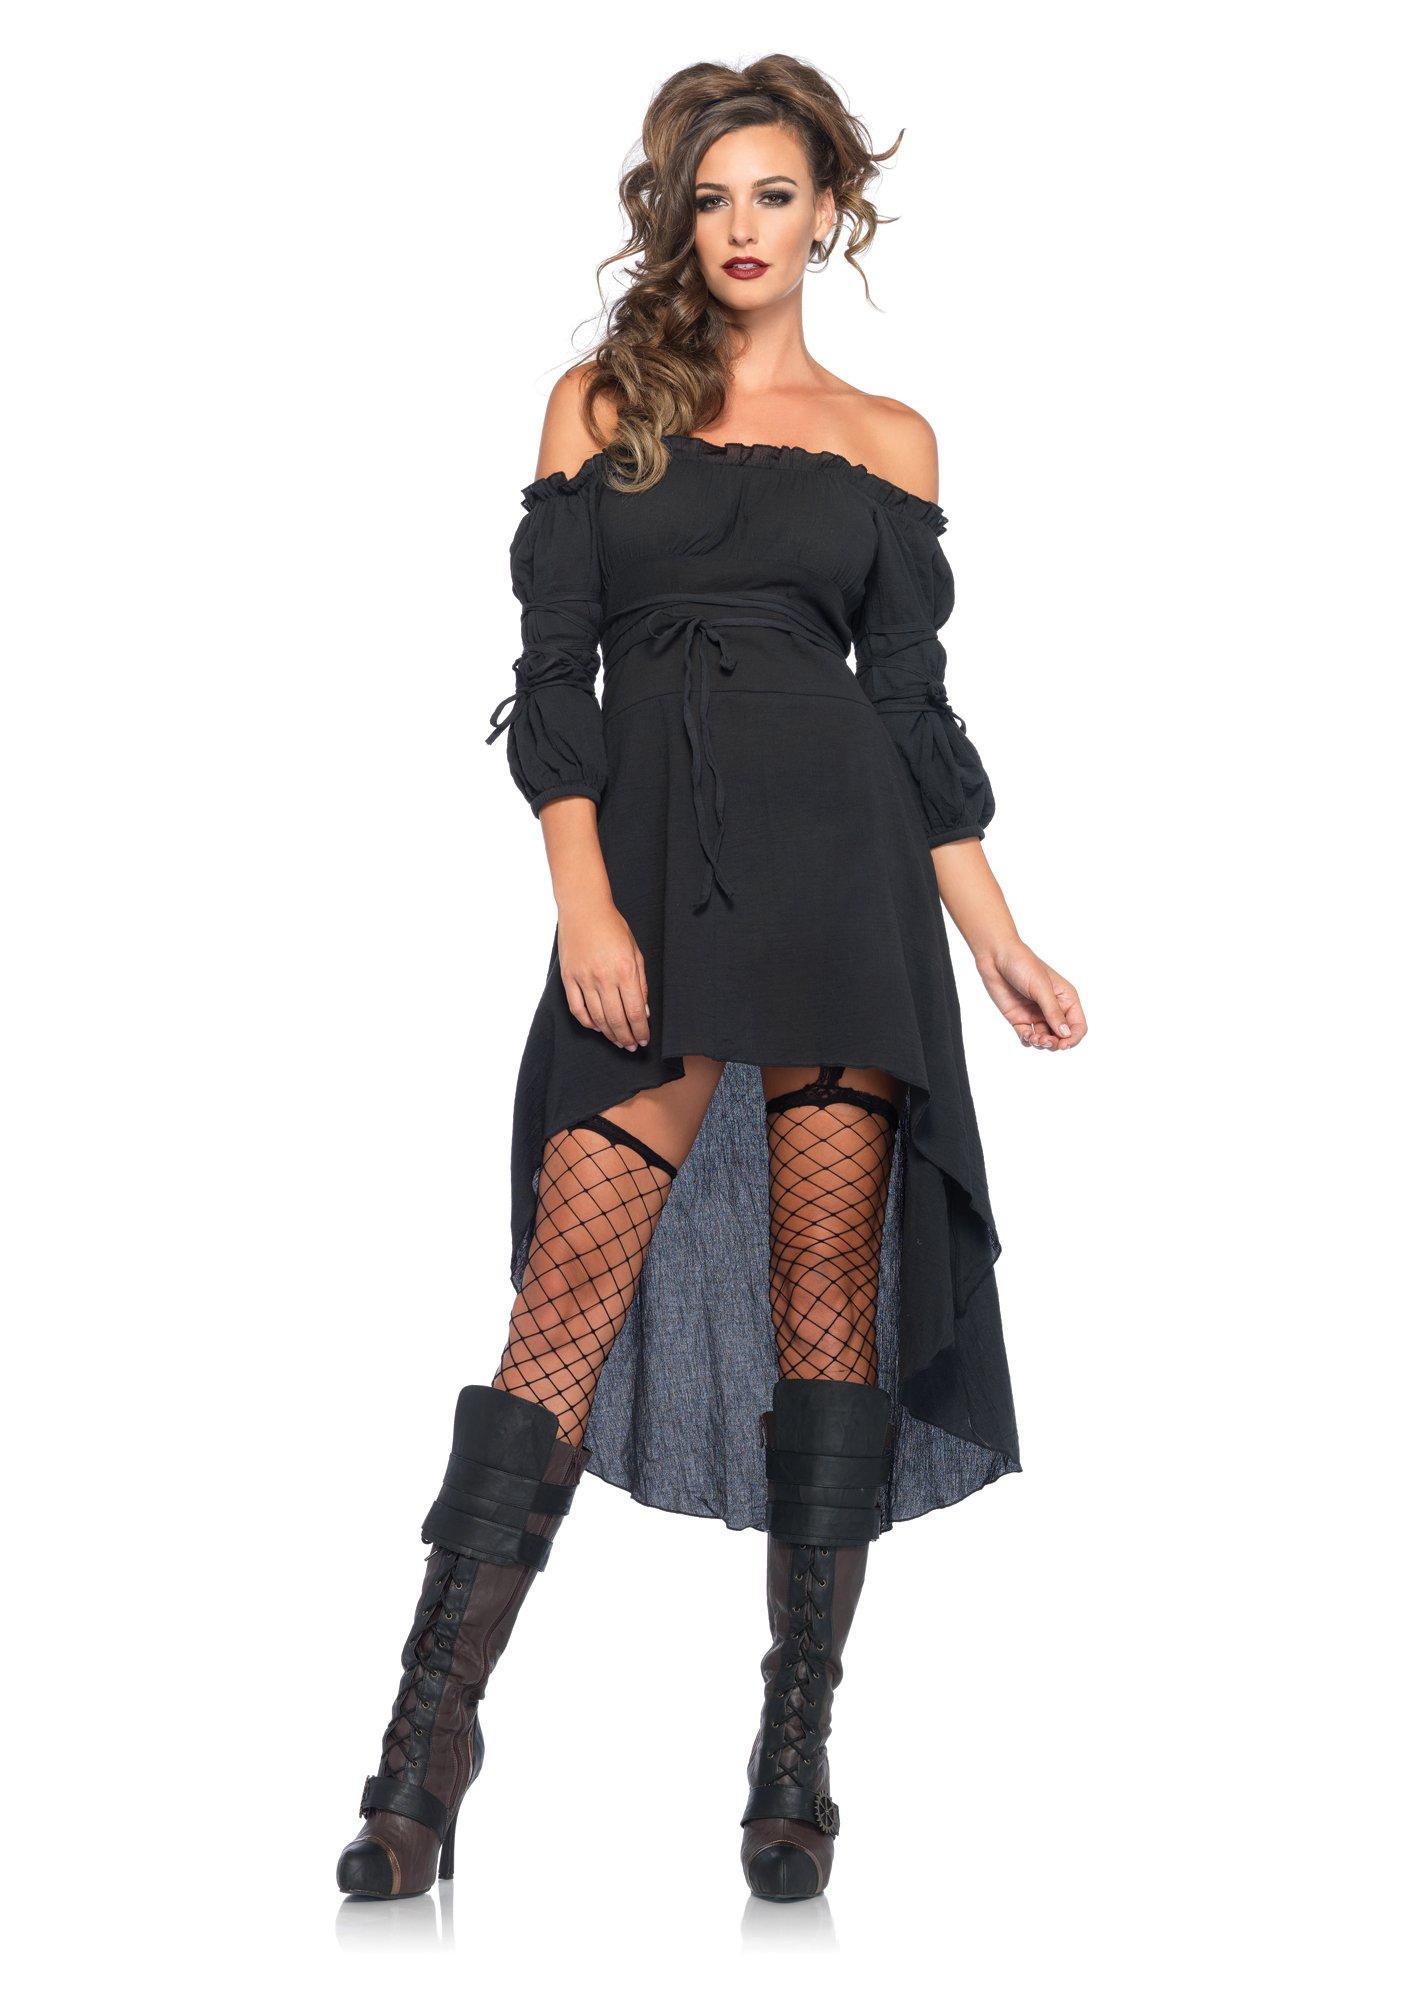 Leg Avenue Women's Plus-Size Plus High Low Peasant Dress Costume, Black, 1X/2X